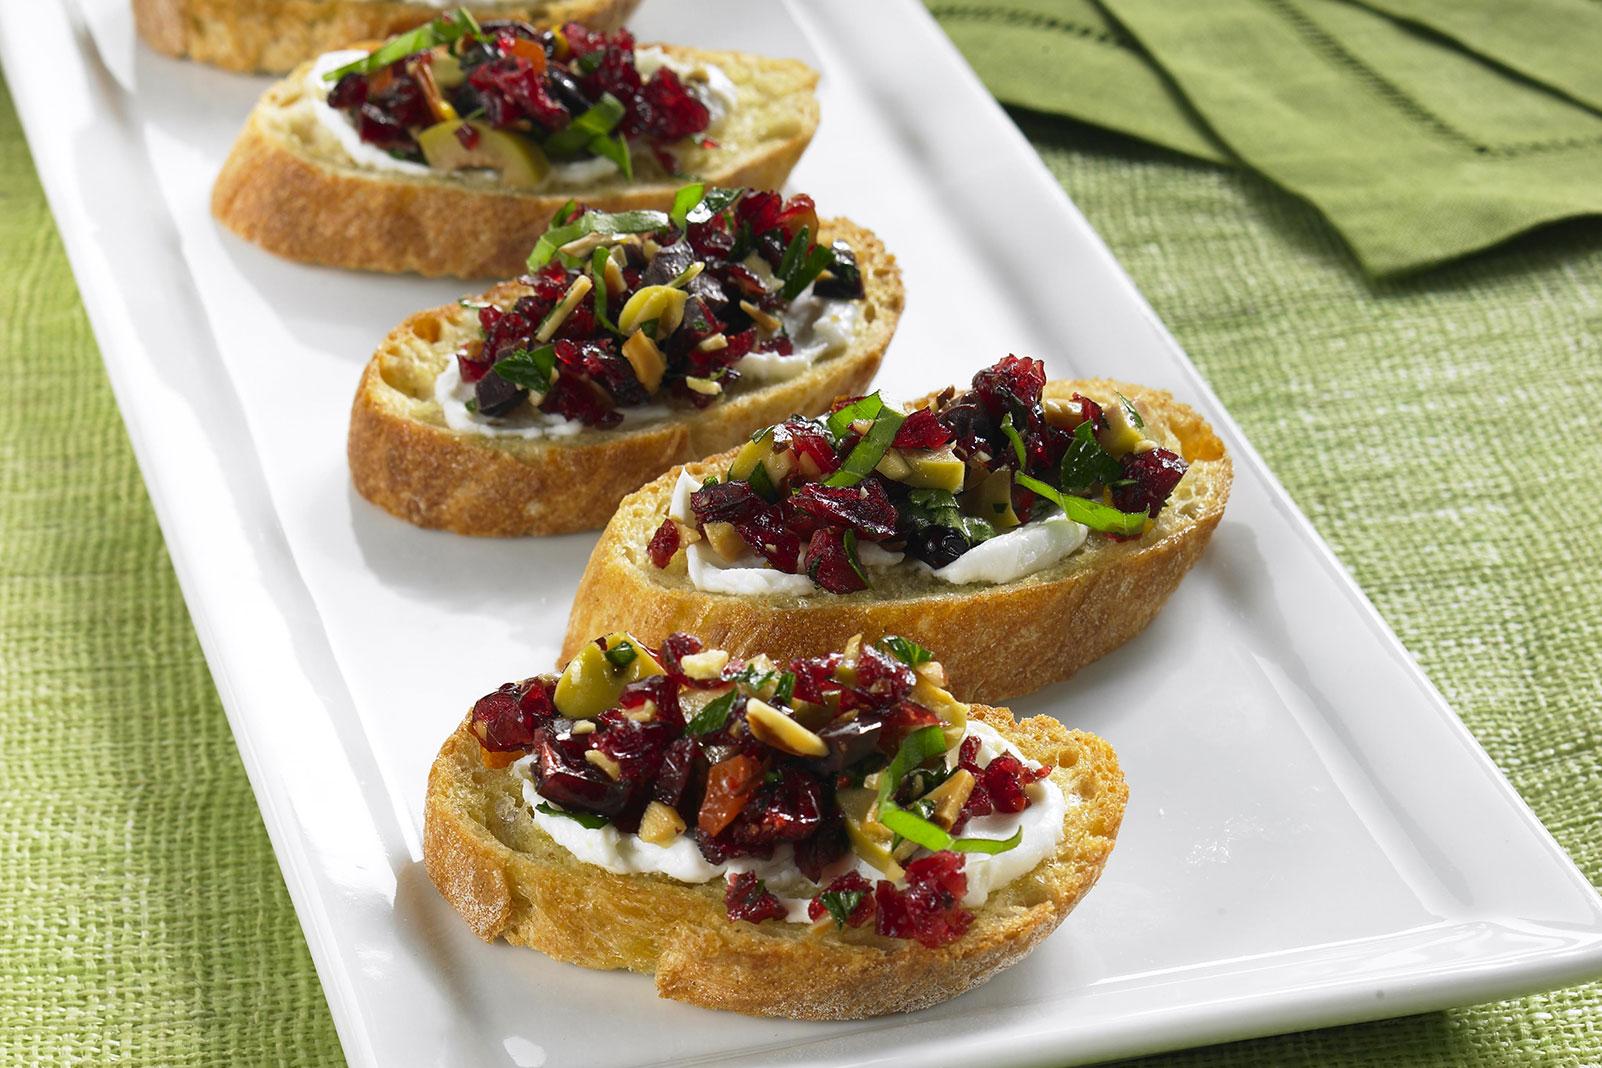 Warm Chevre Crostini with Cranberry Basil Tapenade